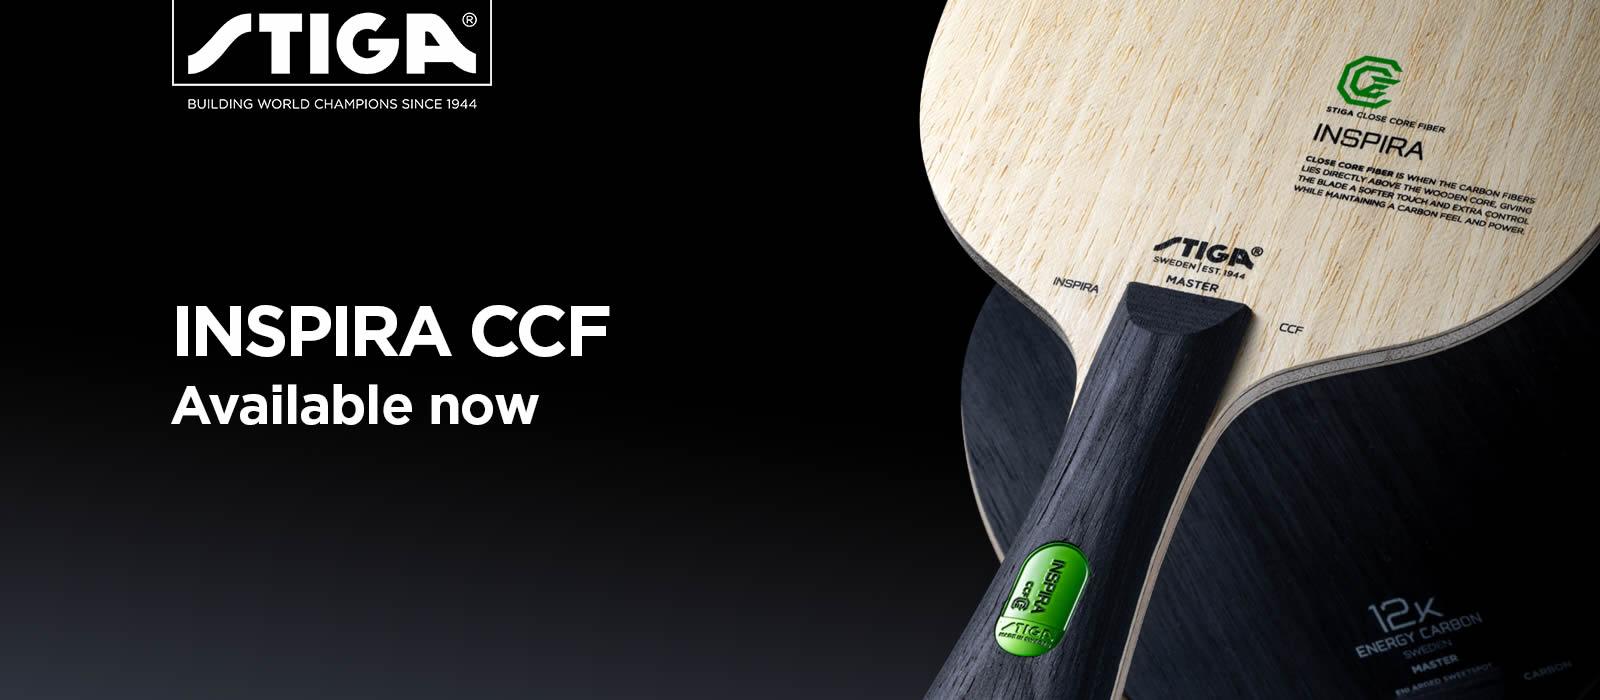 Stiga - Inspira CCF